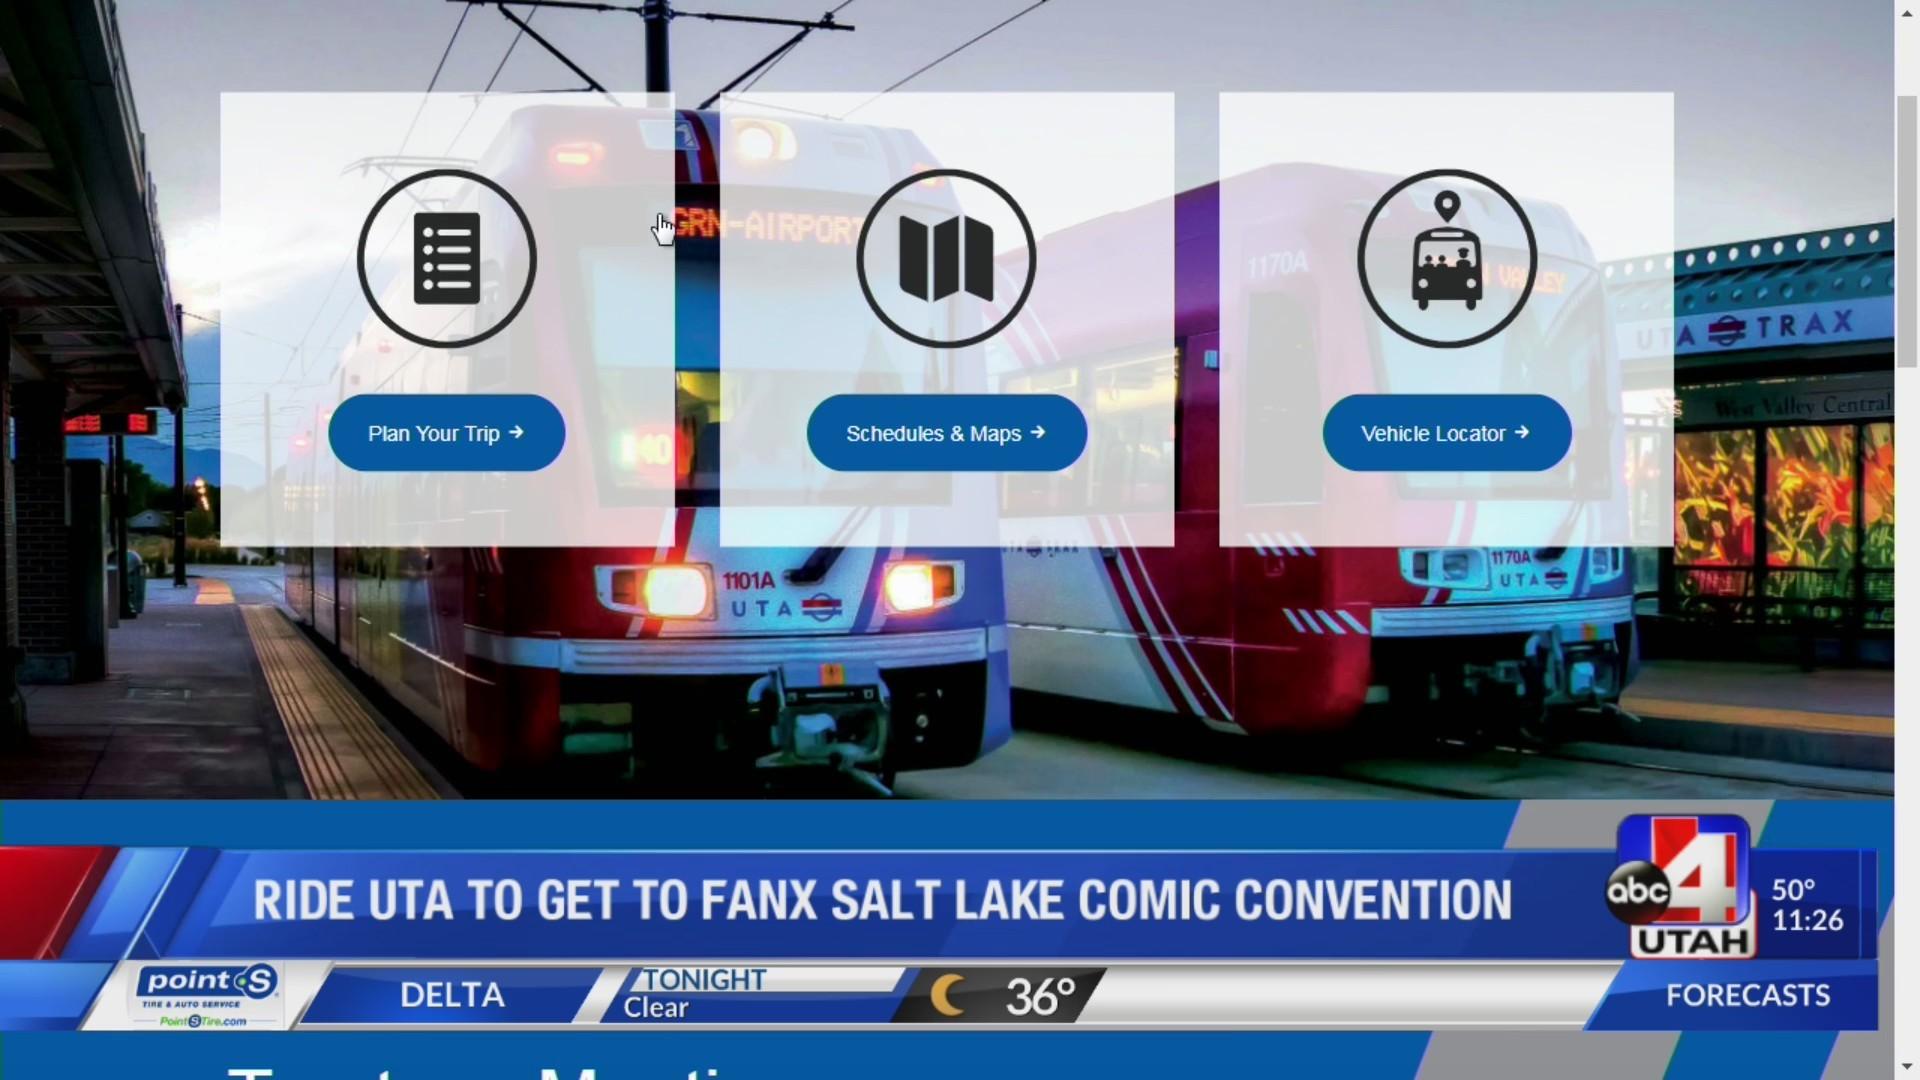 UTA providing additional service for FanX Salt Lake Comic Convention